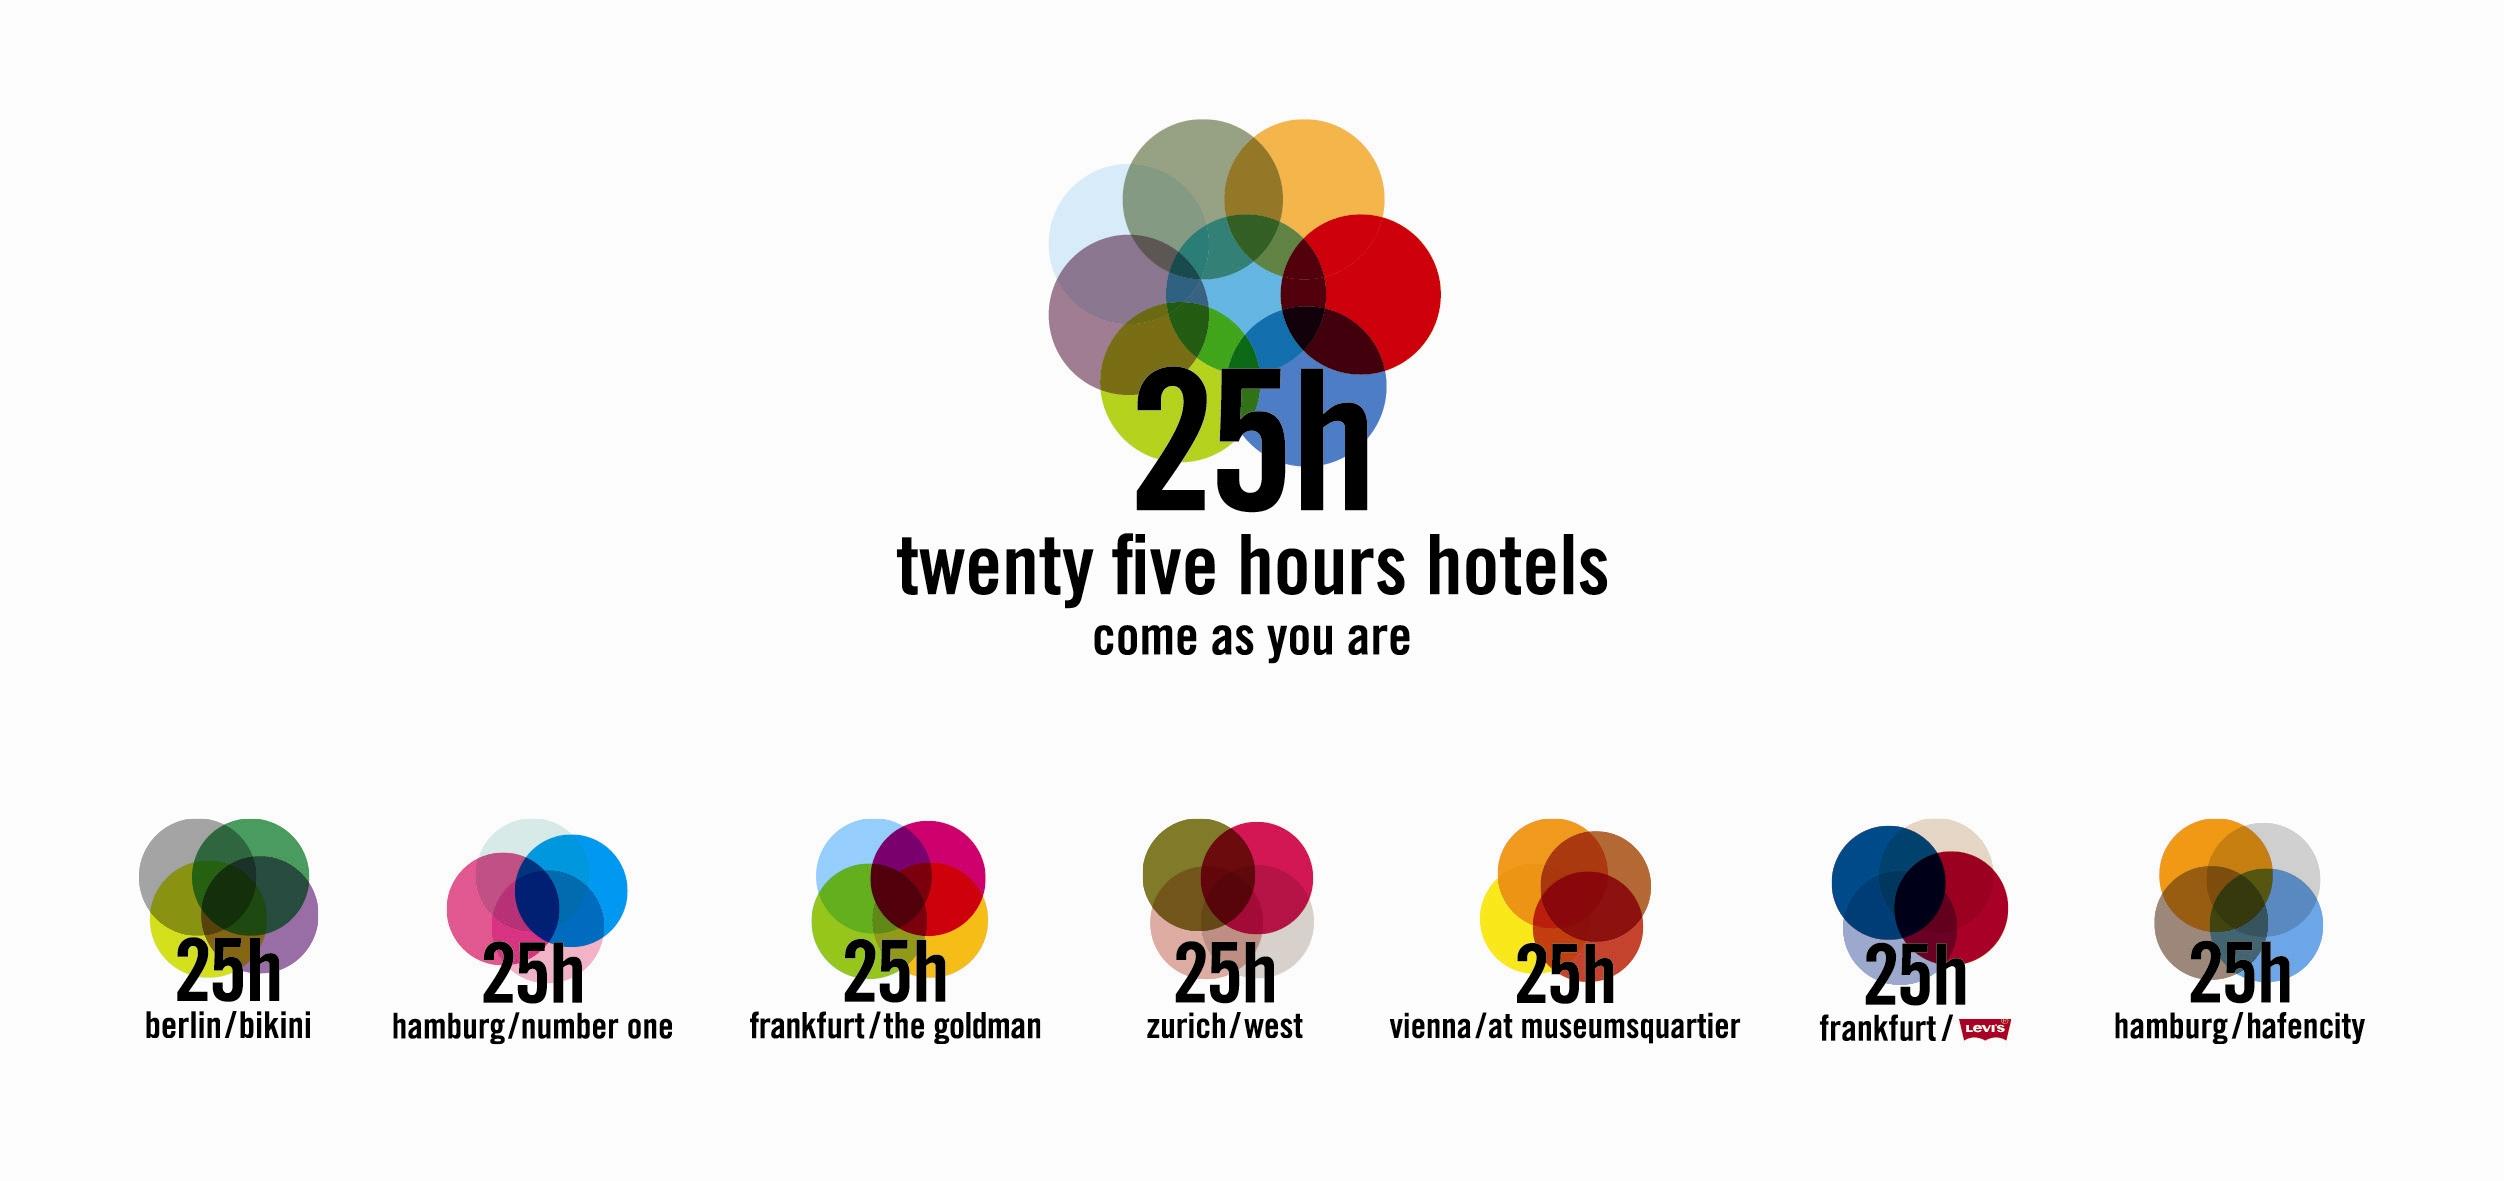 aufgefrischtes logo f252r 25 hours hotels zum firmenjubil228um